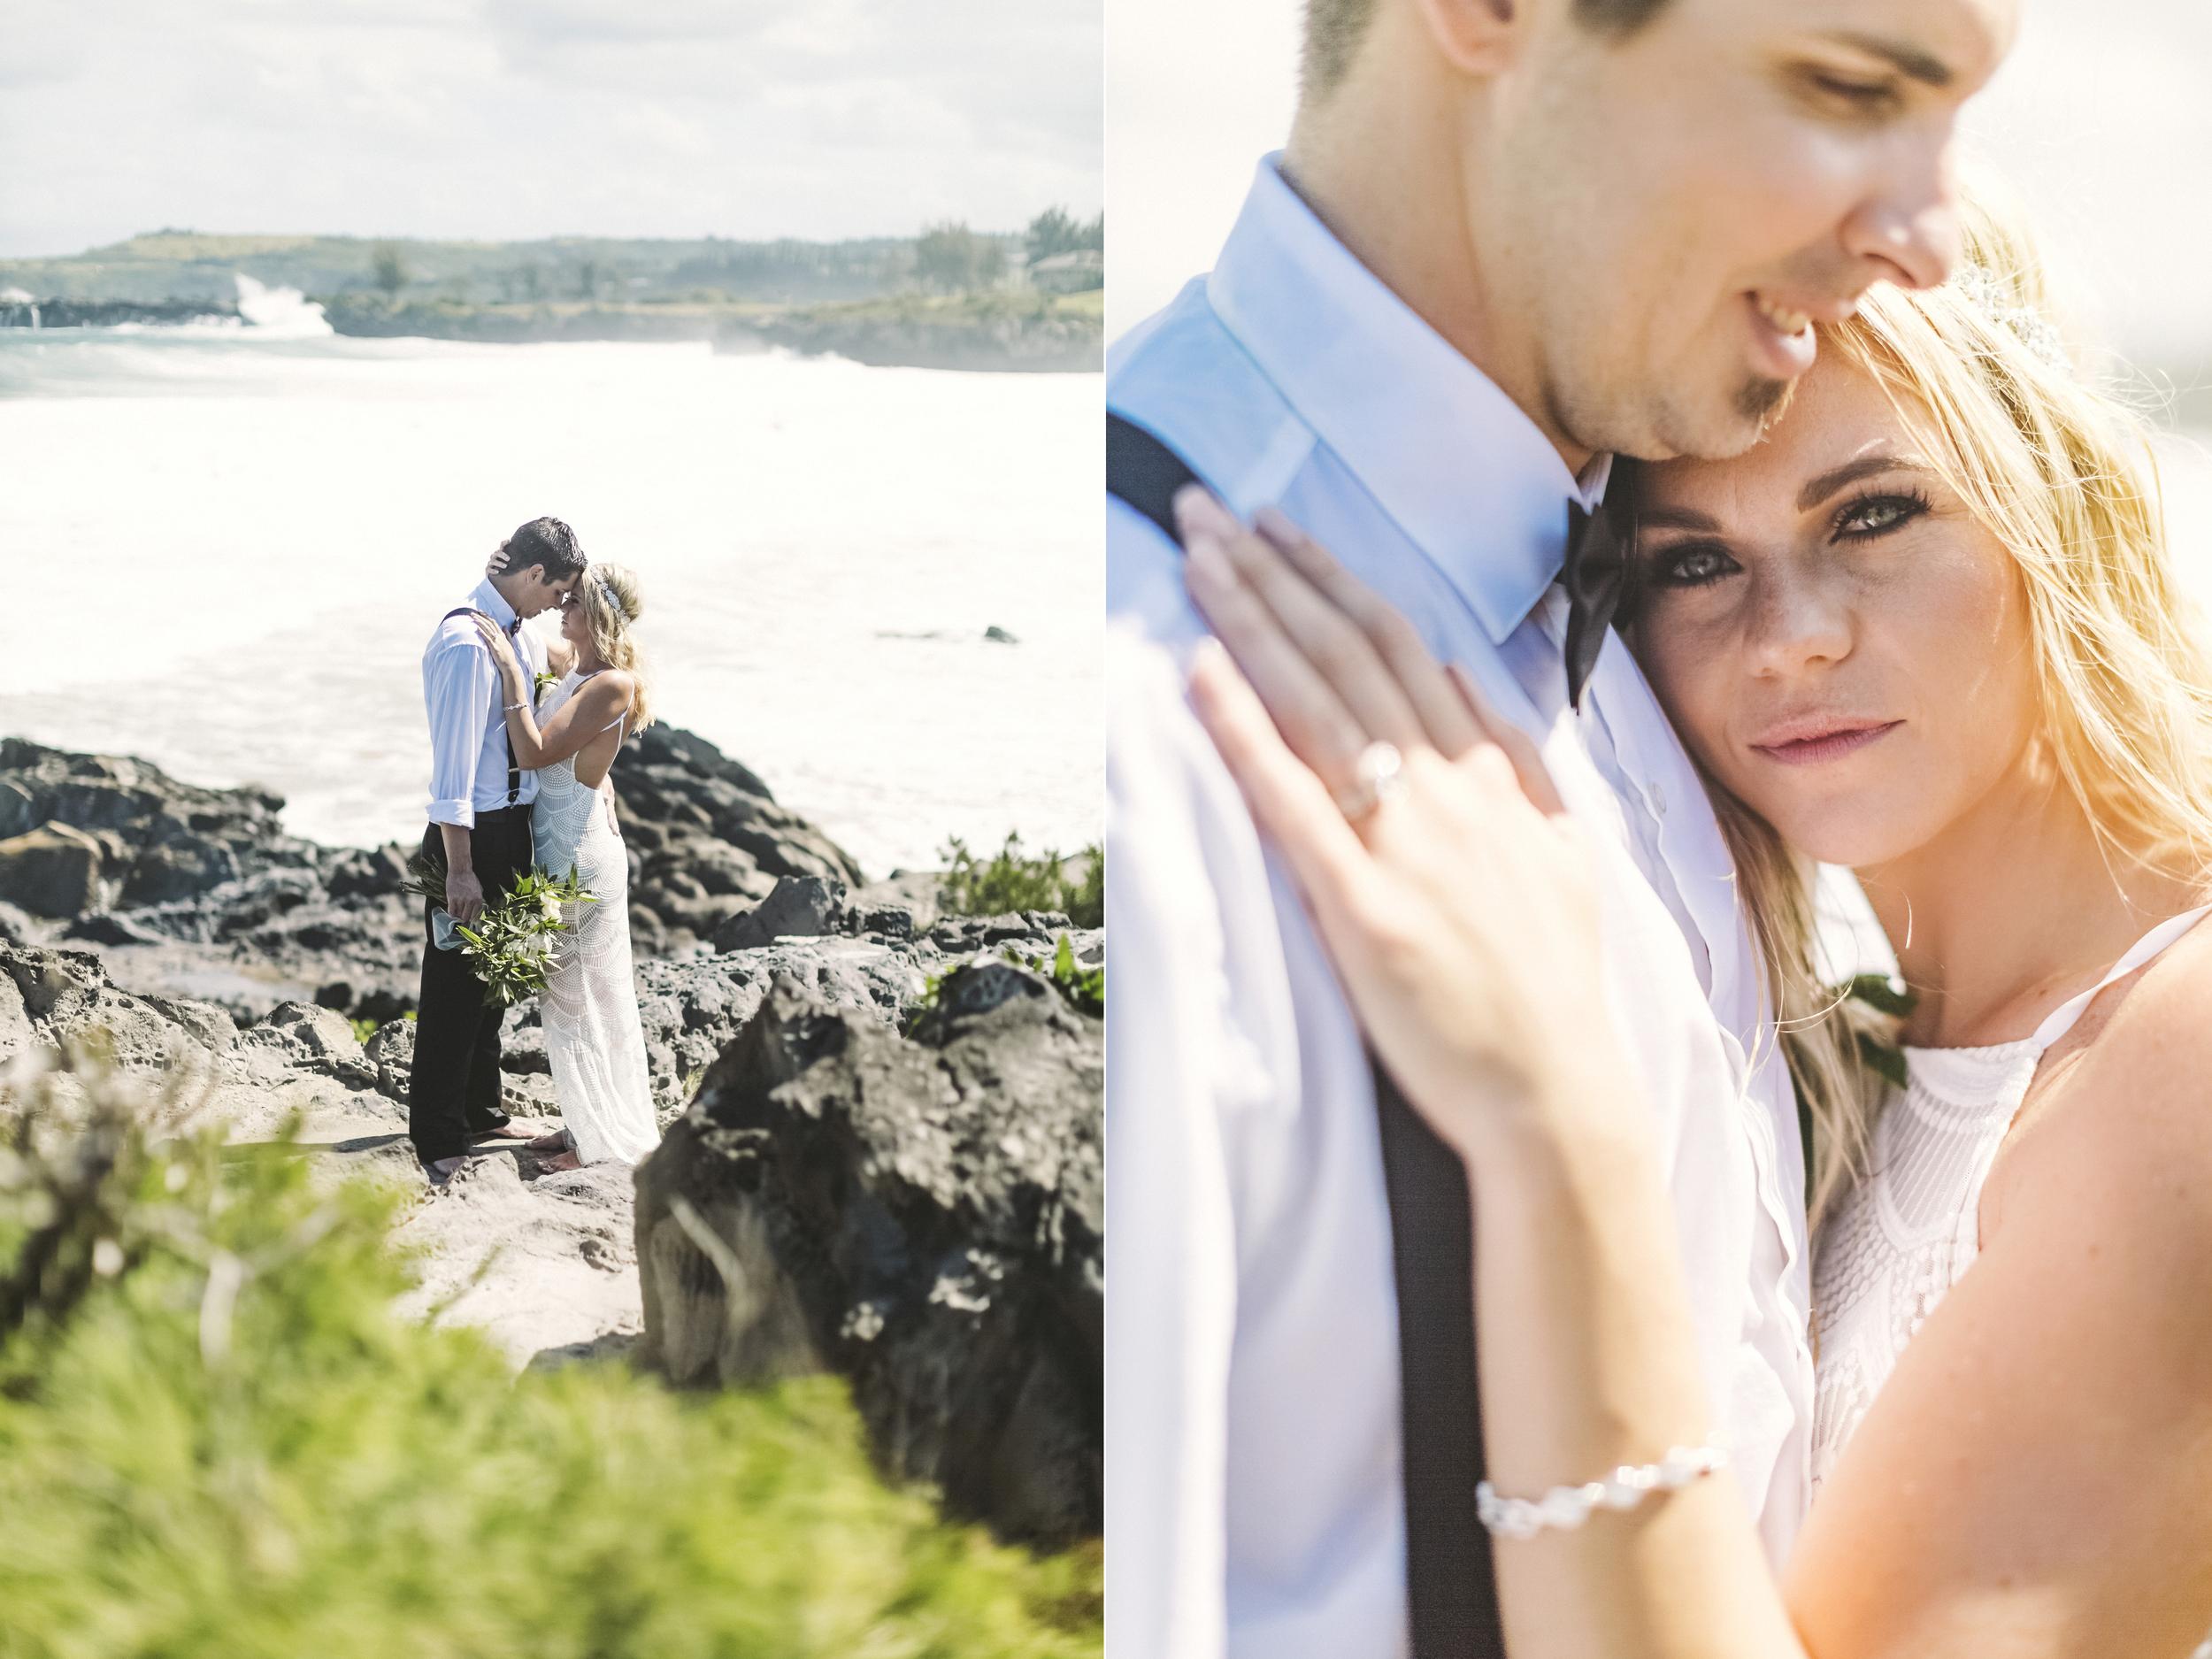 angie-diaz-photography-hawaii-wedding-48.jpg